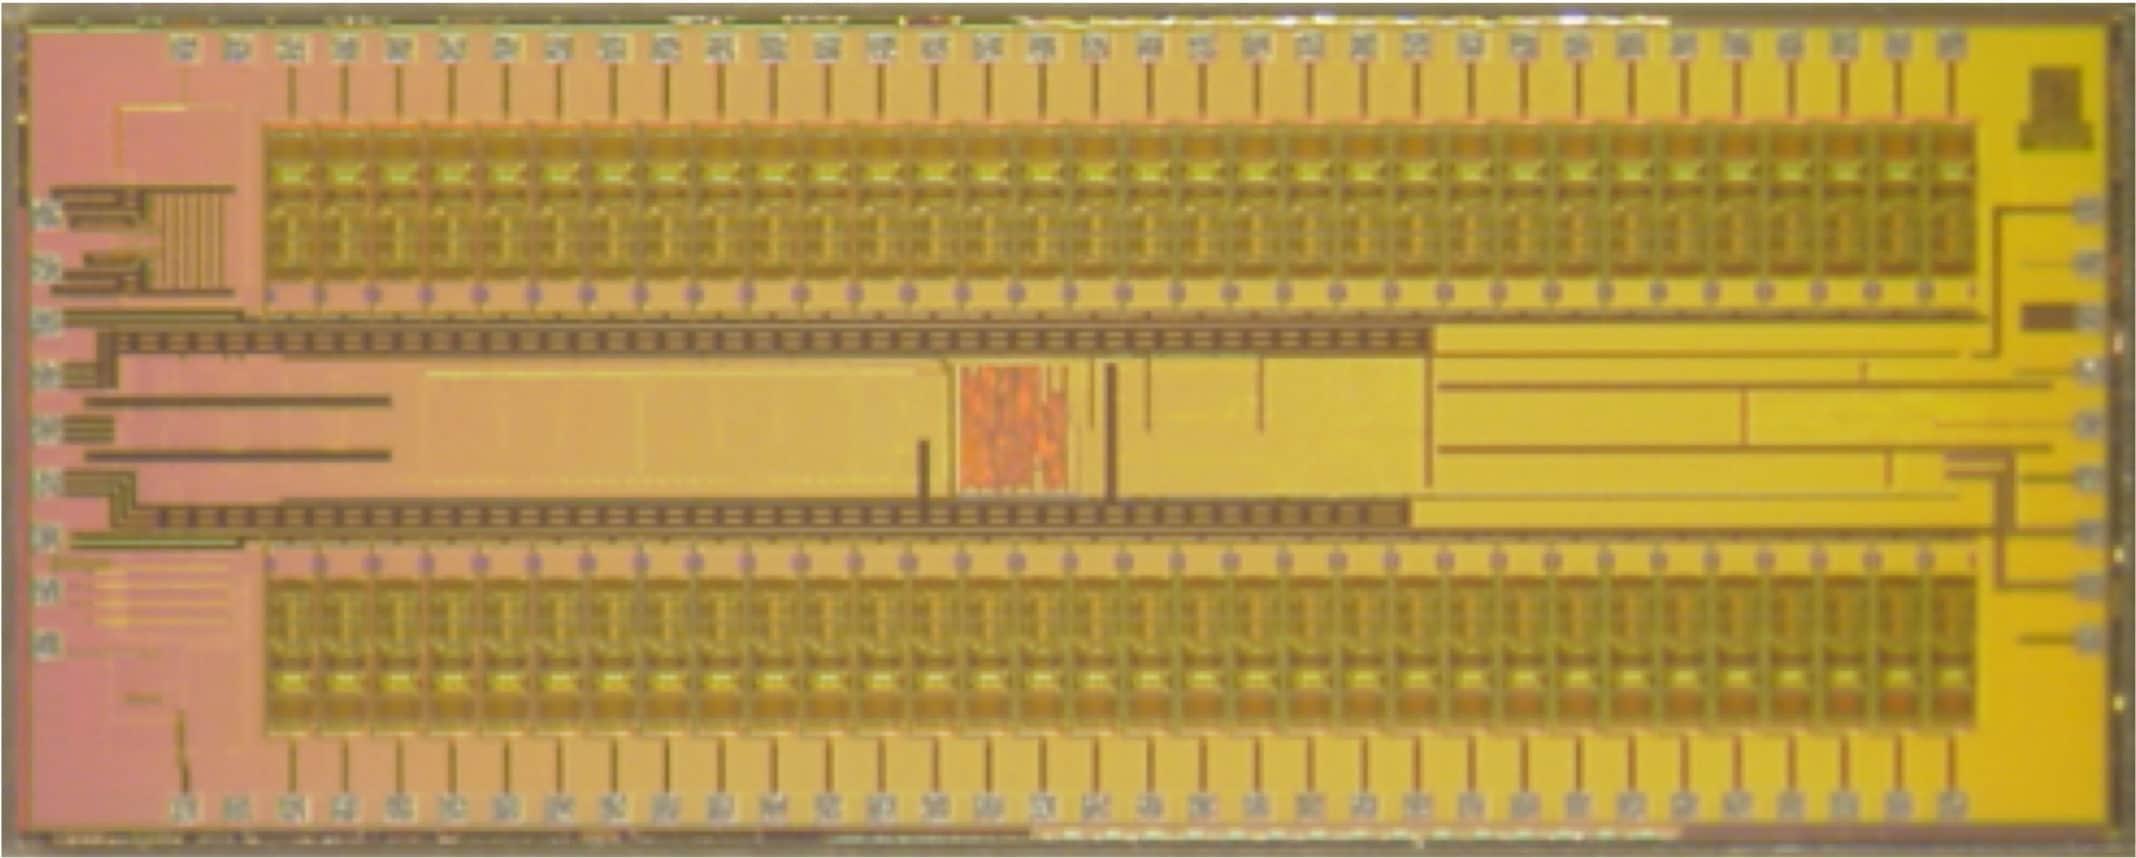 WAND's custom integrated circuits. (credit: Rikky Muller, UC Berkeley)